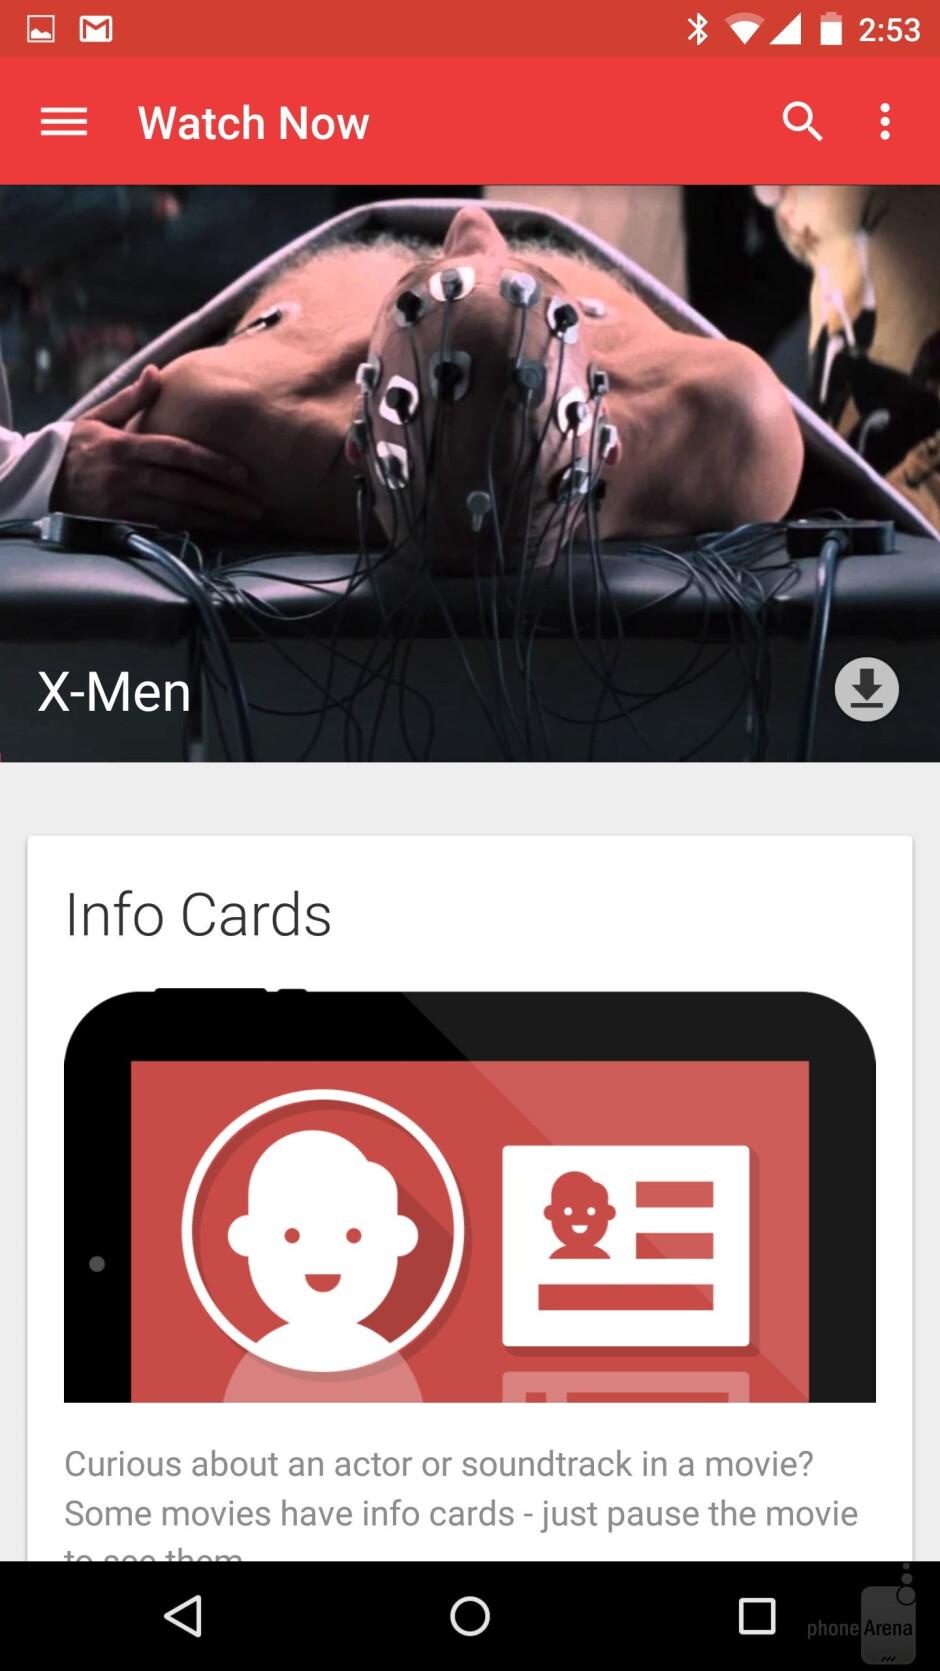 Enjoying your media files on the Nexus 6 - Google Nexus 6 vs Apple iPhone 6 Plus